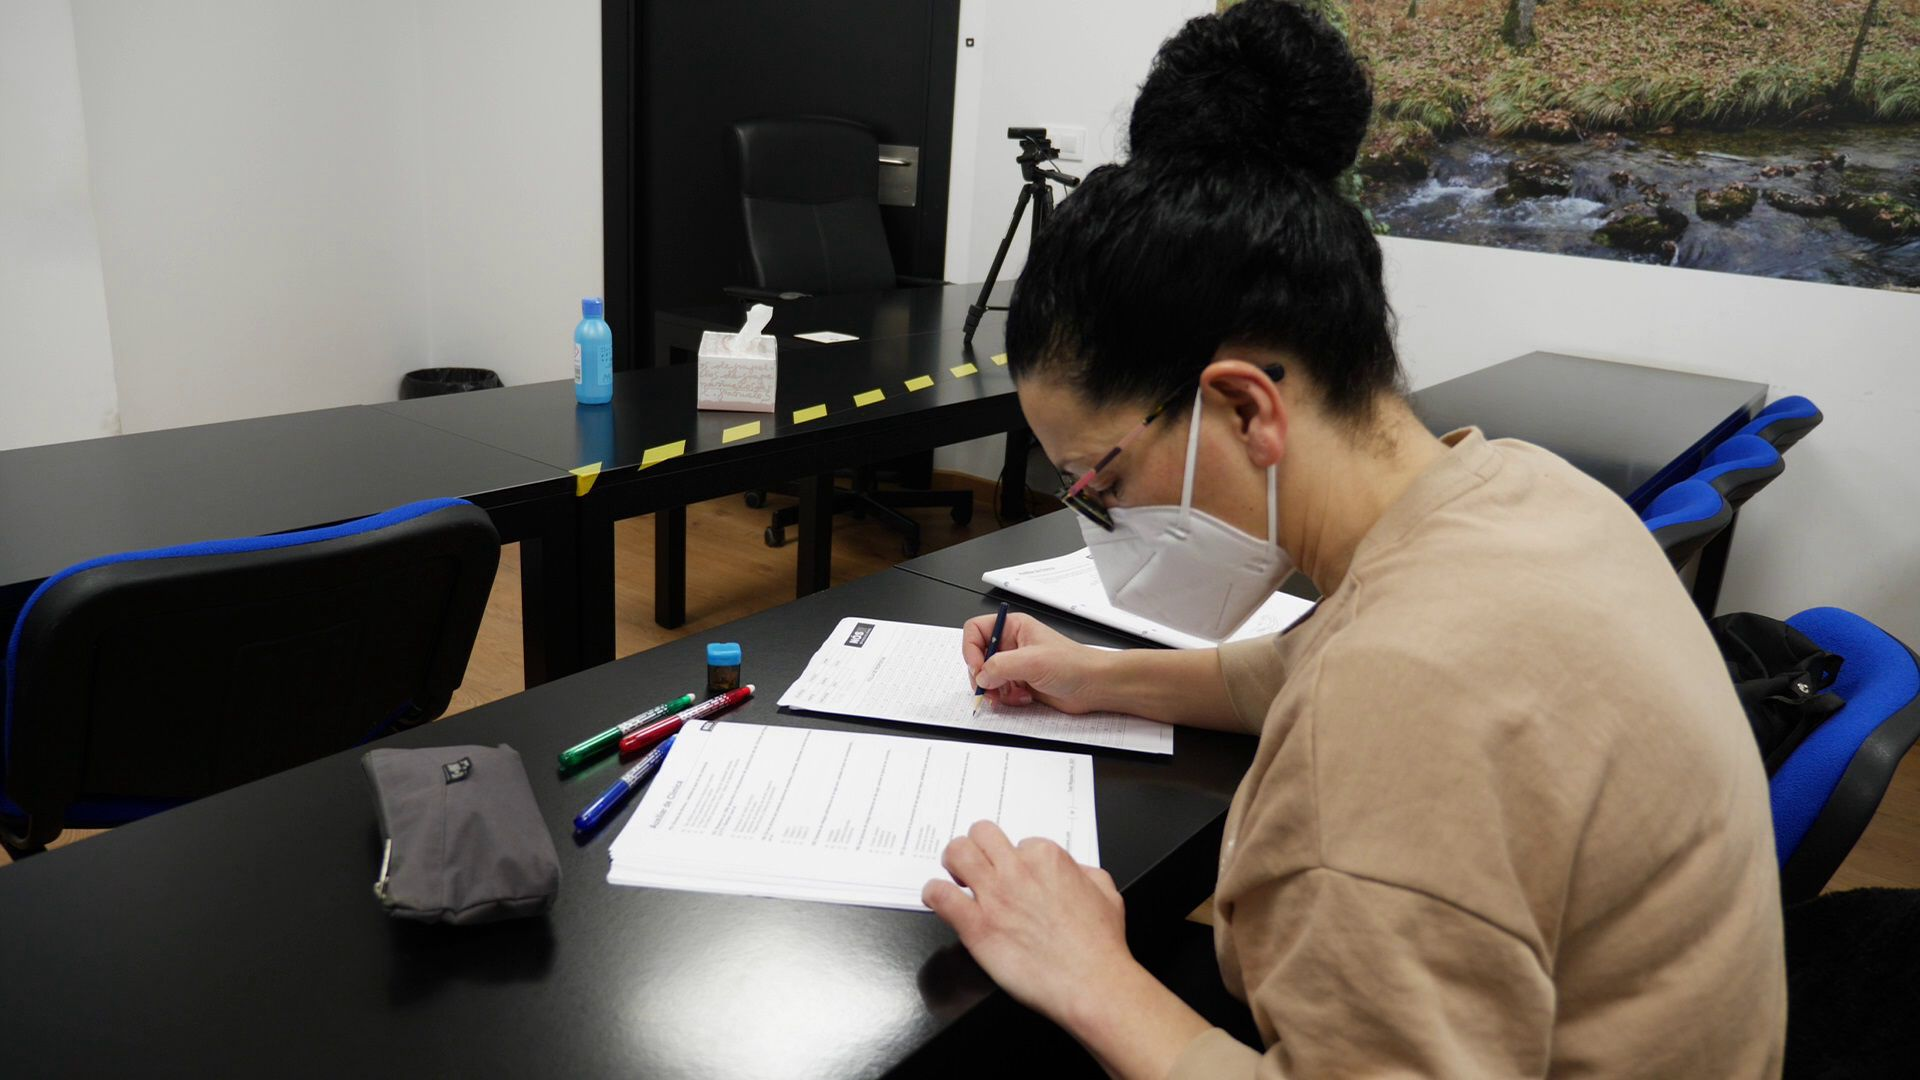 Esther Quintáns, opositora a TCAE, en la academia Nós Oposicións donde preparar las pruebas